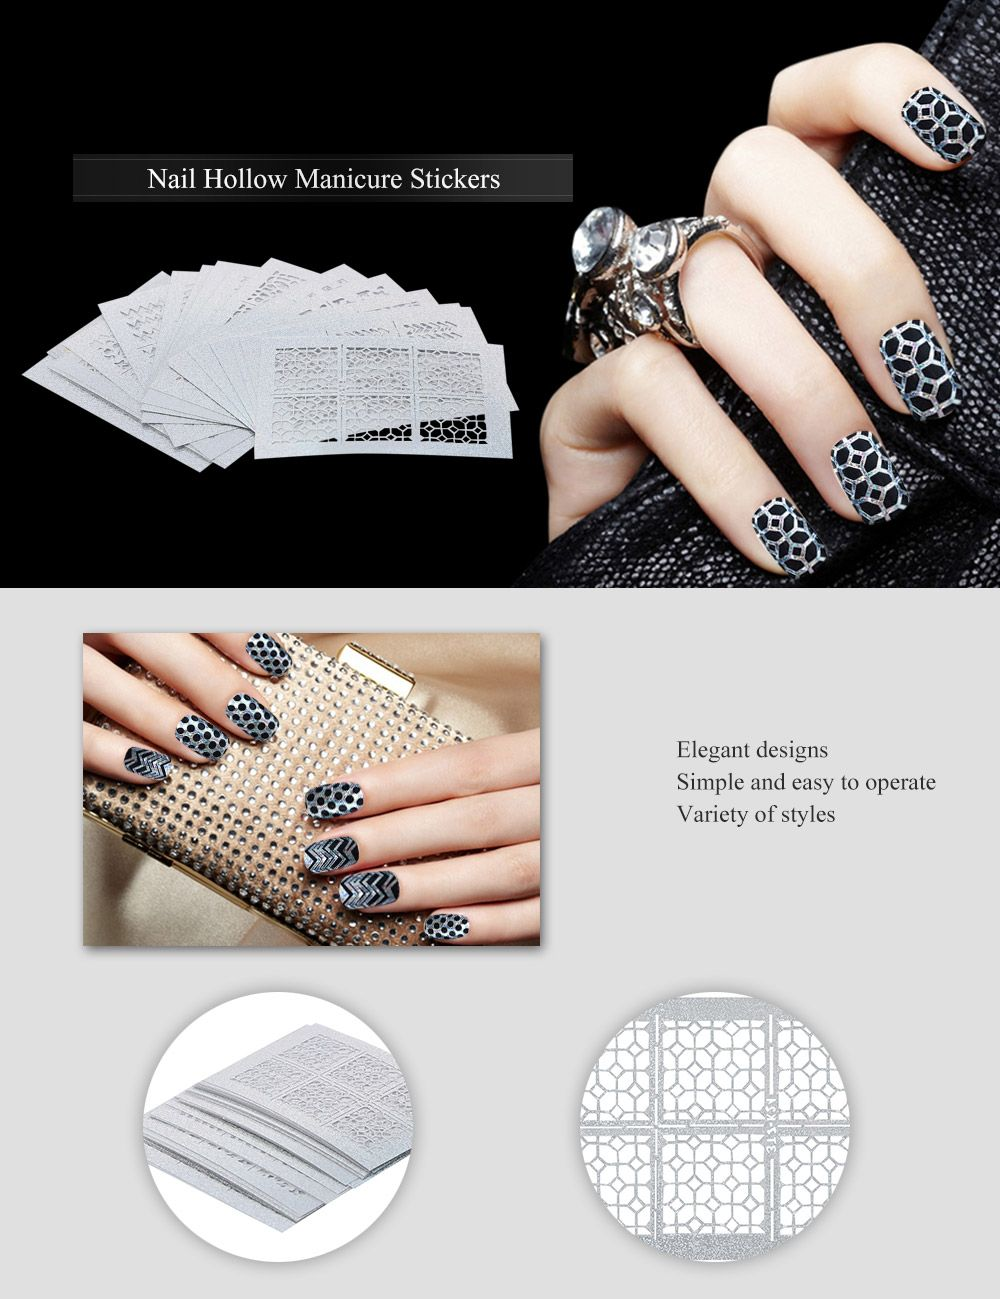 24pcs Nail Vinyls Hollow Irregular Grid Stencil Reusable Manicure Stickers